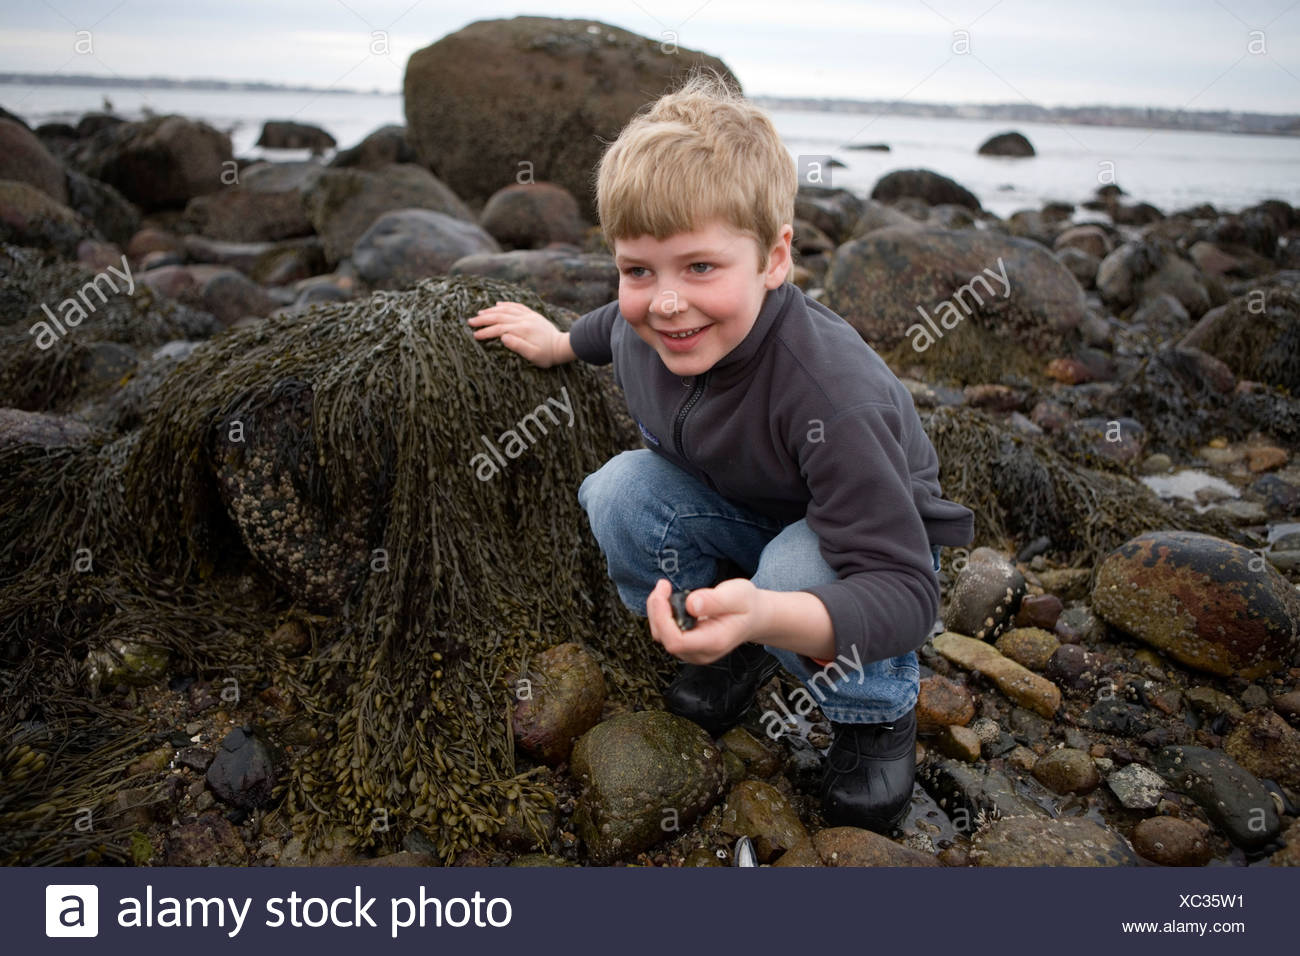 A boy exploring an inter-tidal zone. - Stock Image